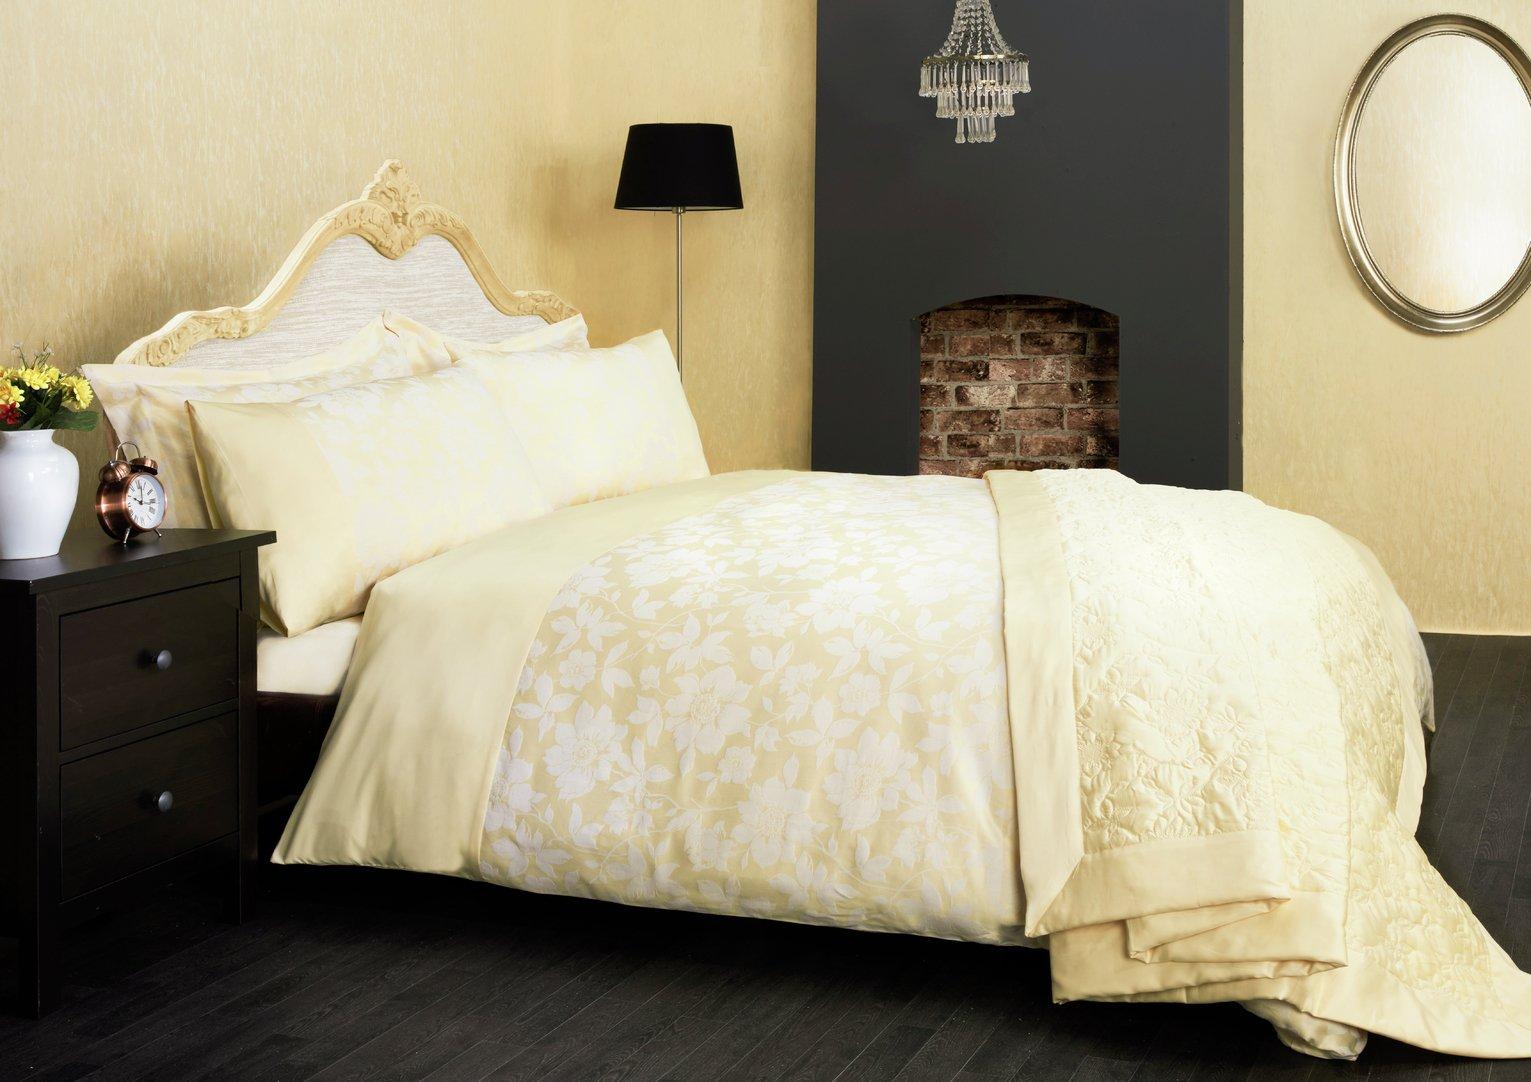 Julian Charles Lottie Lemon Pair of Housewife Pillowcases